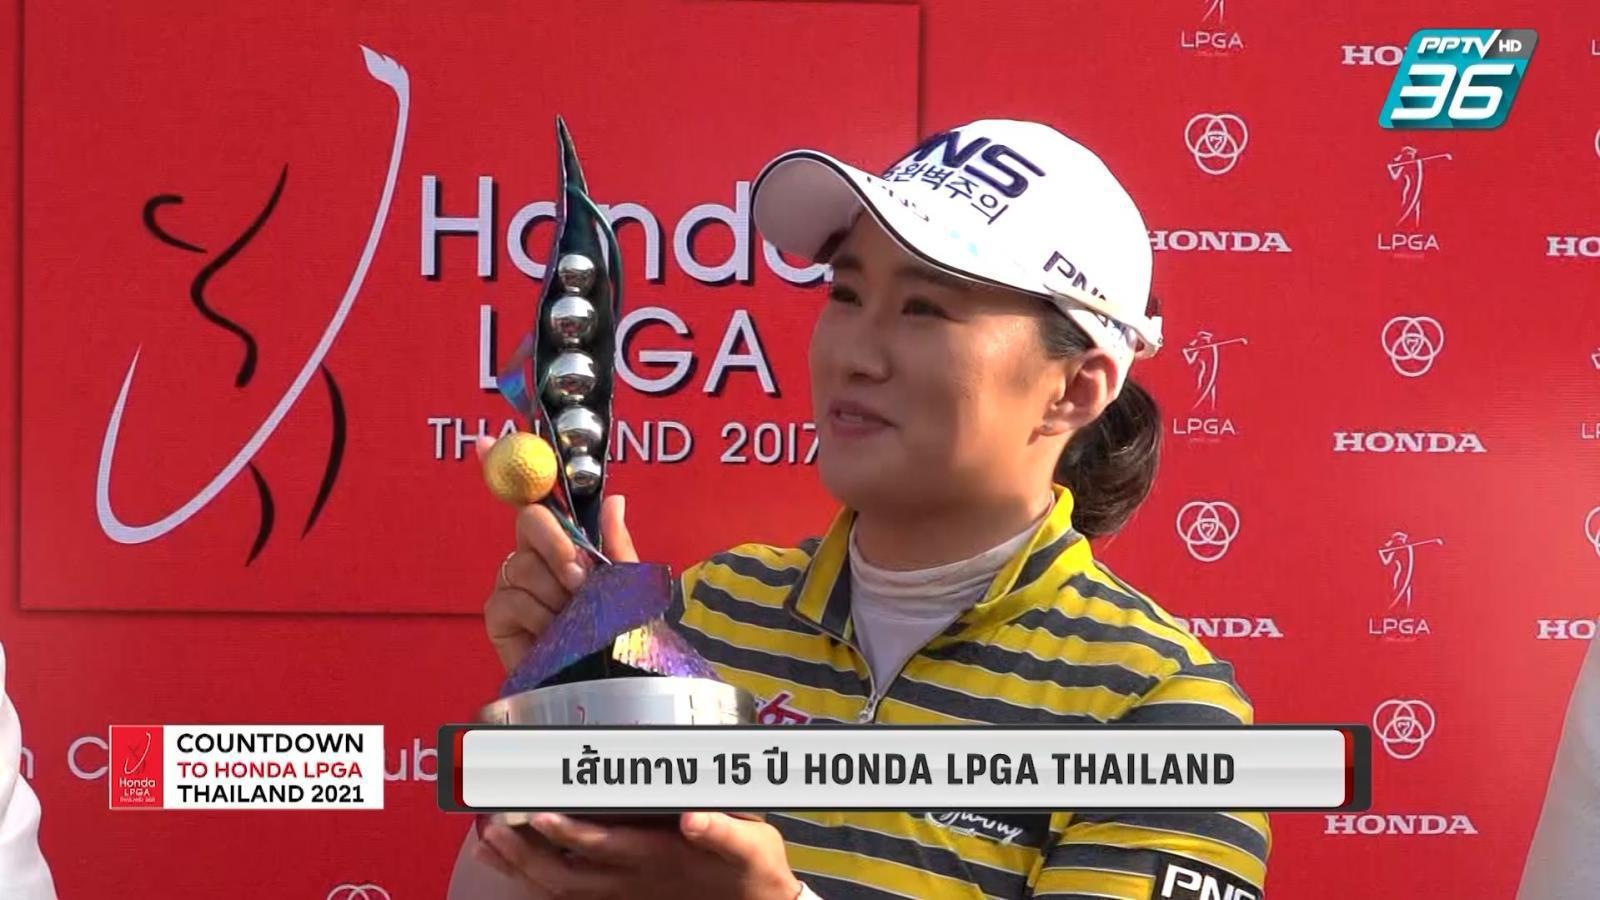 Countdown to Honda LPGA Thailand 2021 : ตอนที่ 1